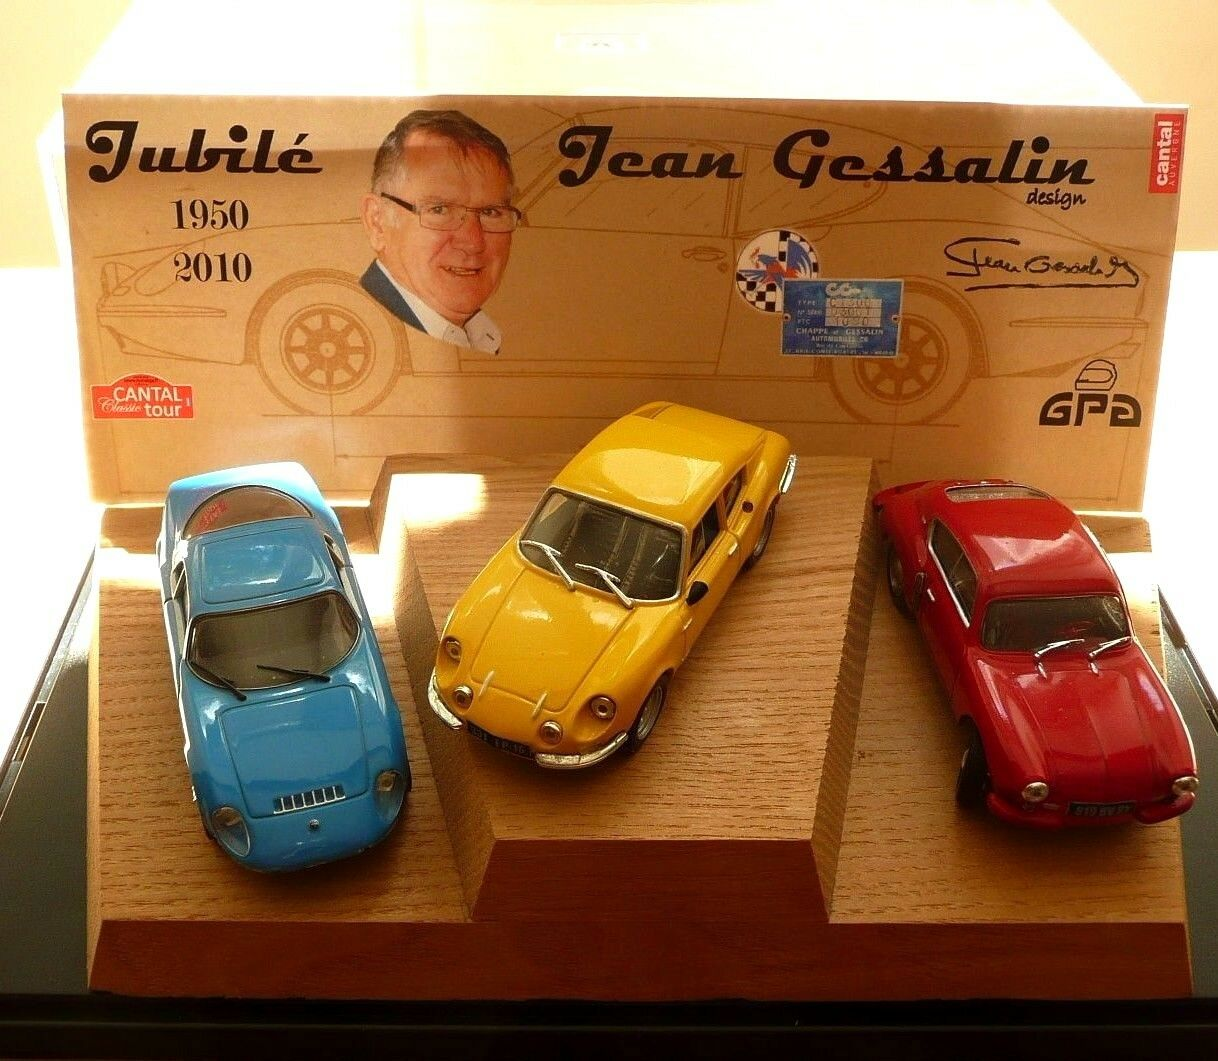 MC43 & CG 1.43   PODIUM HOMMAGE j. GESSALIN   CG coupé + A106 + DJET   no Ixo